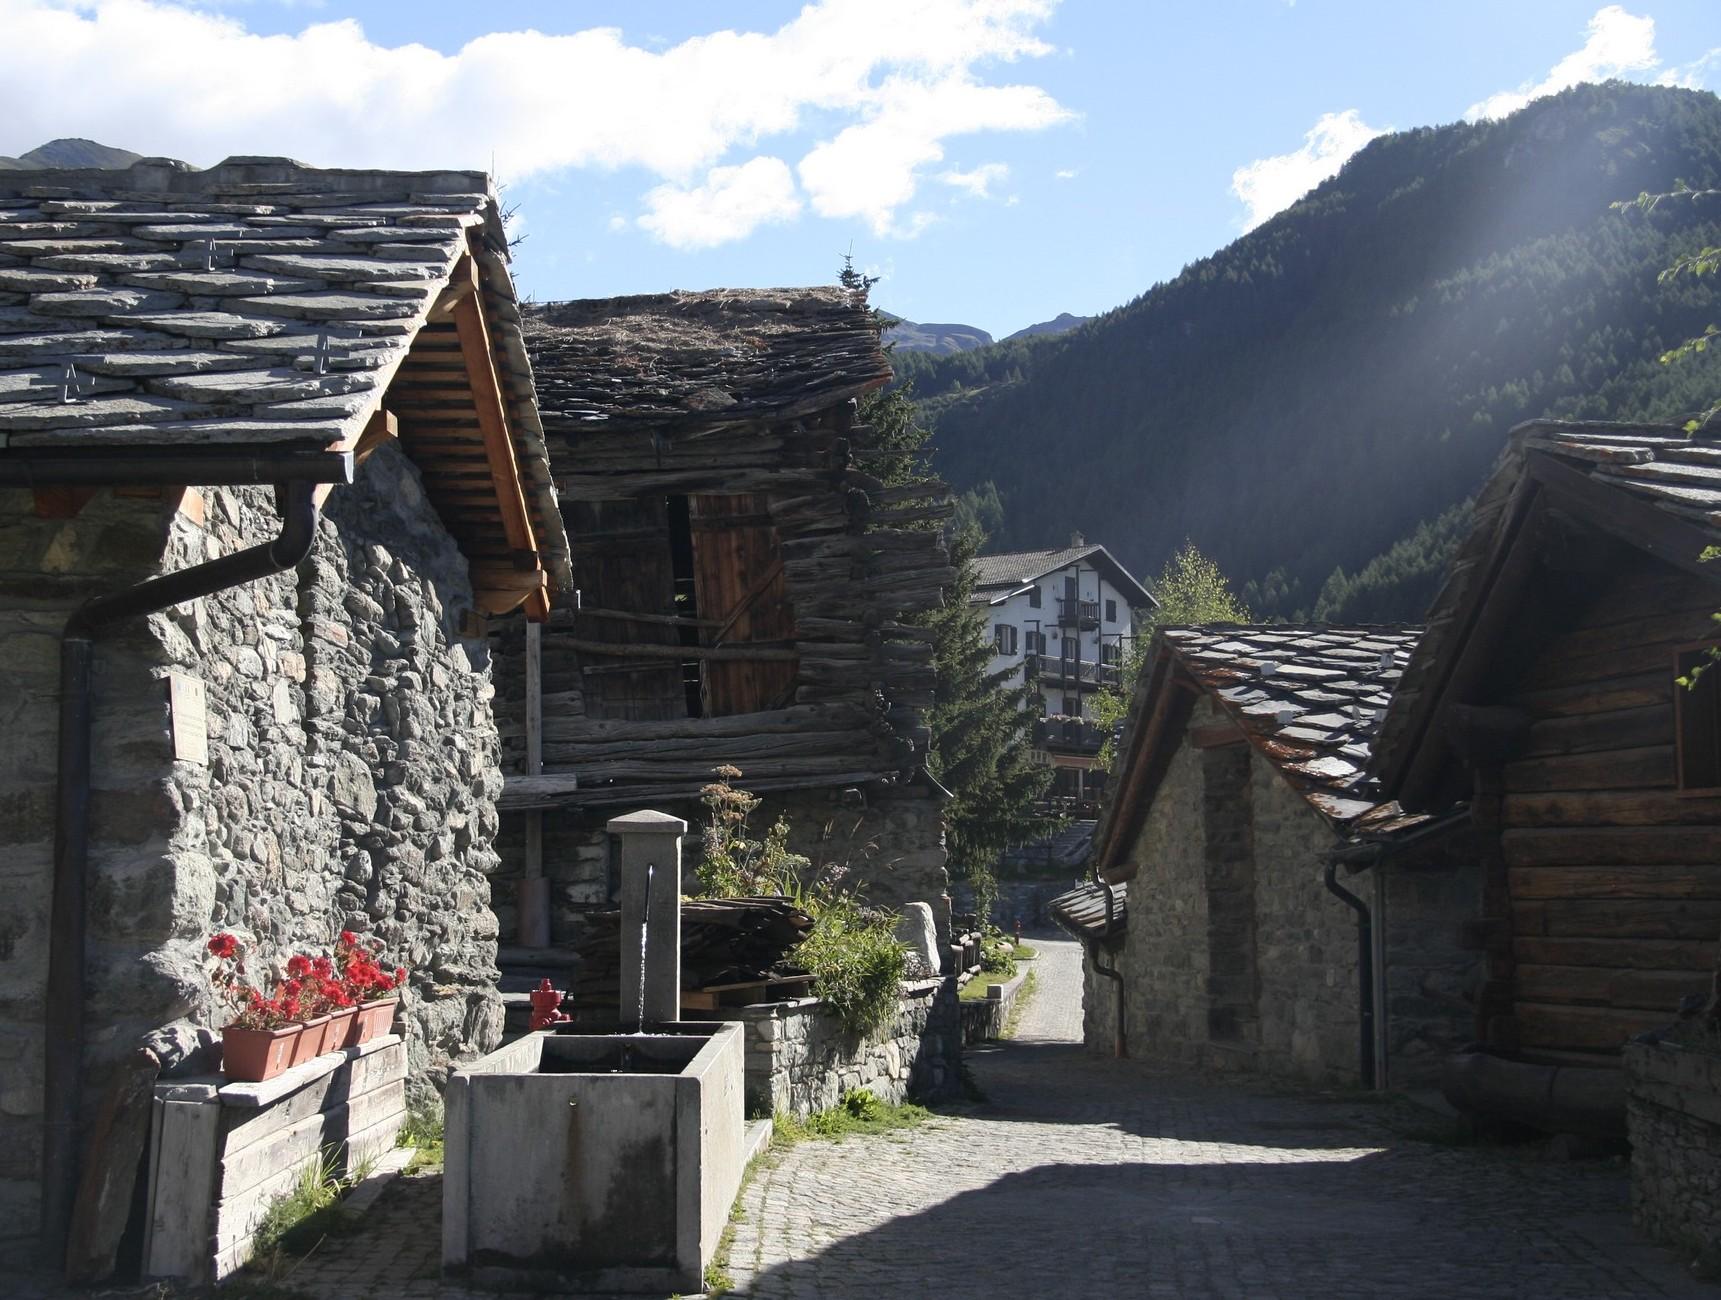 Chamois in Valle d'Aosta ©Foto Anna Bruno